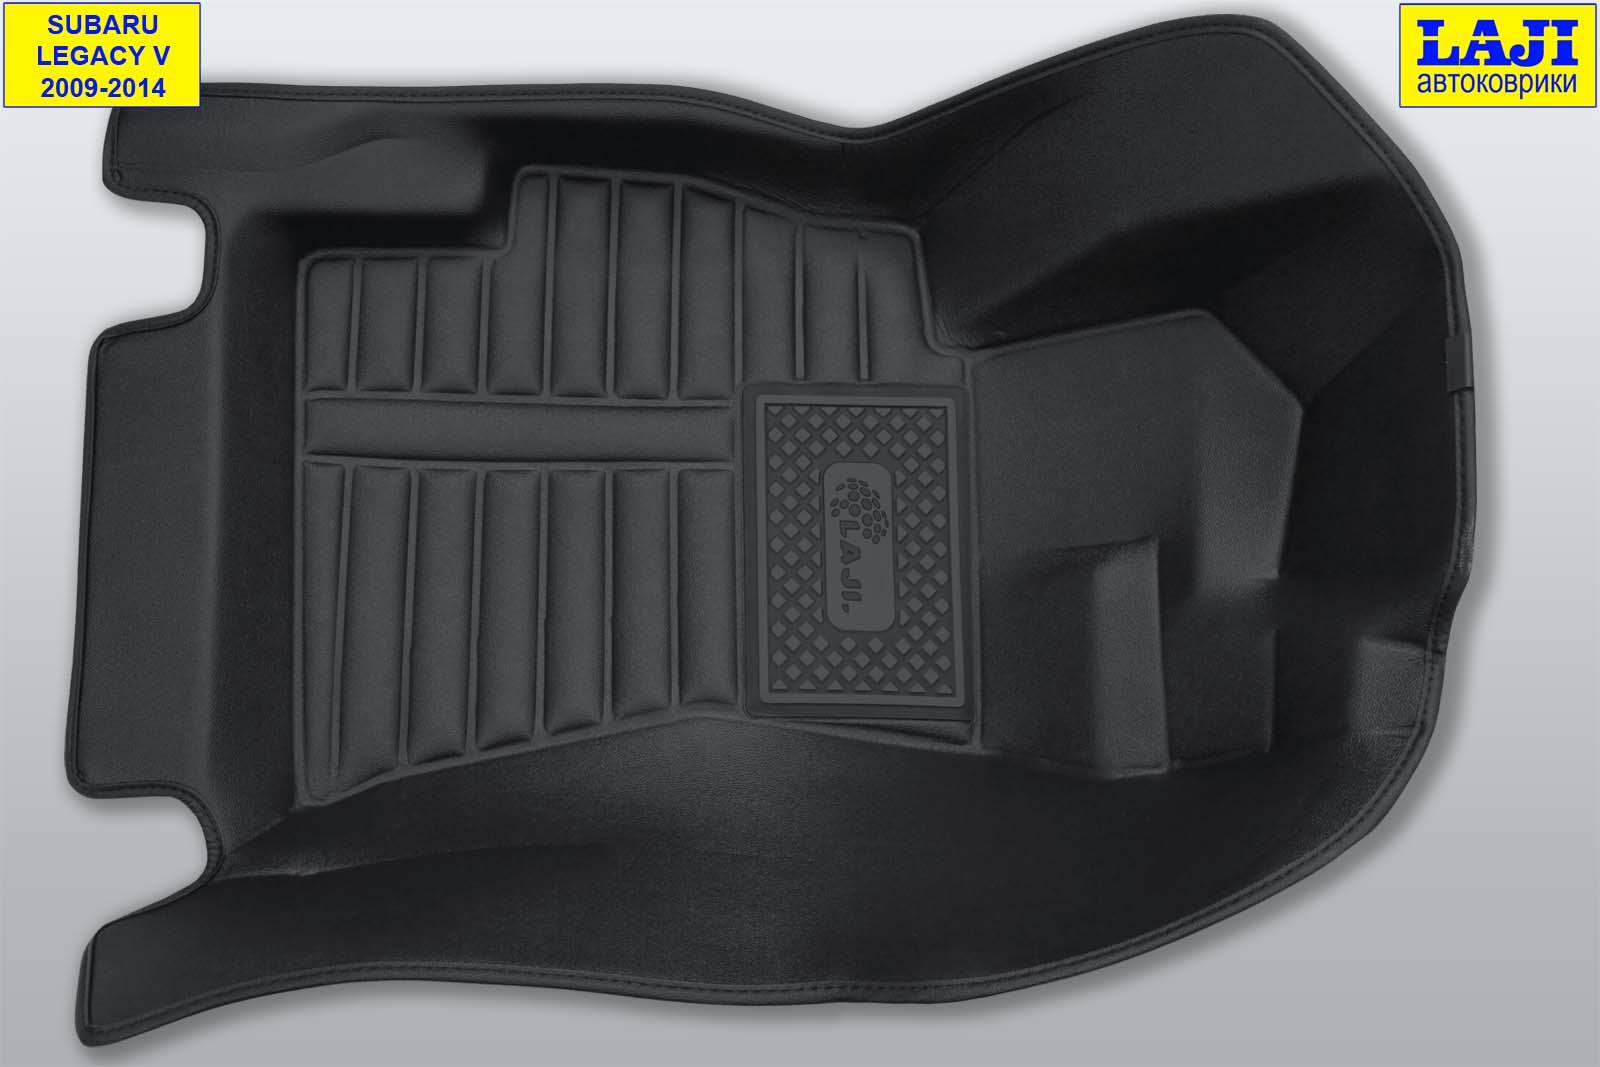 5D коврики в салон Subaru Legacy 5 2009-2014 2